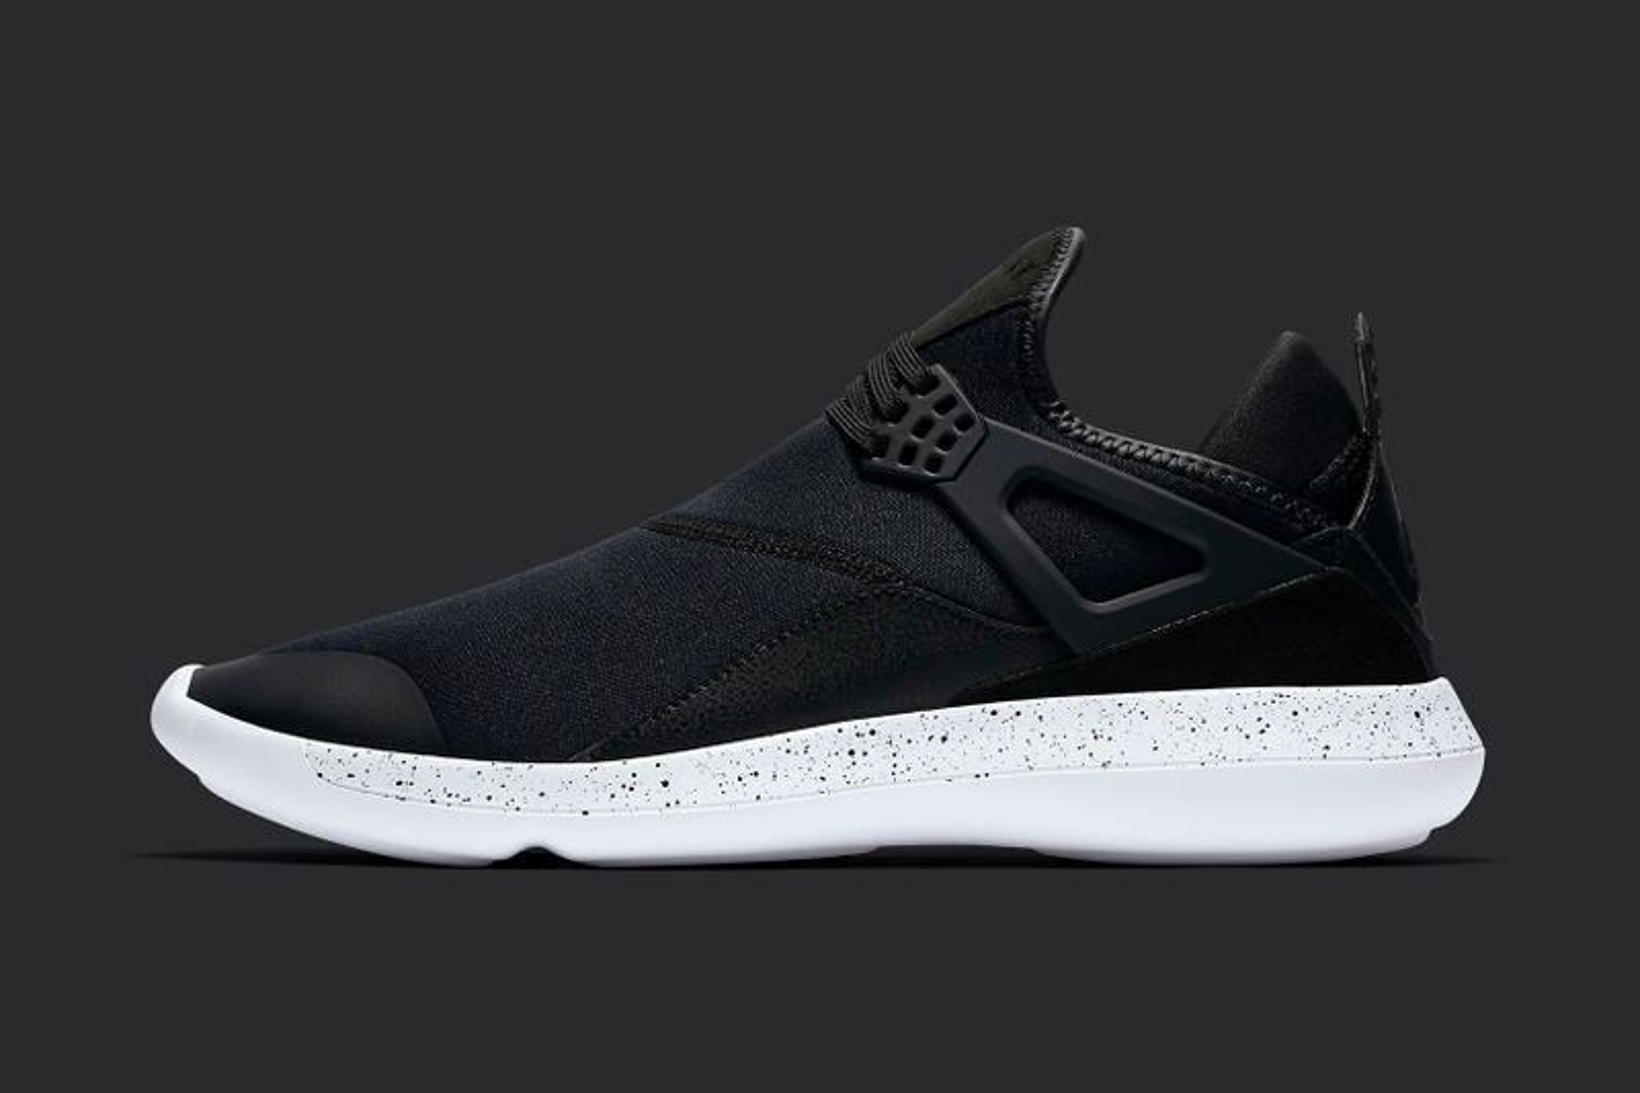 The Air Jordan 4 Inspires Jordan Brand's Latest Cozy Silhouette